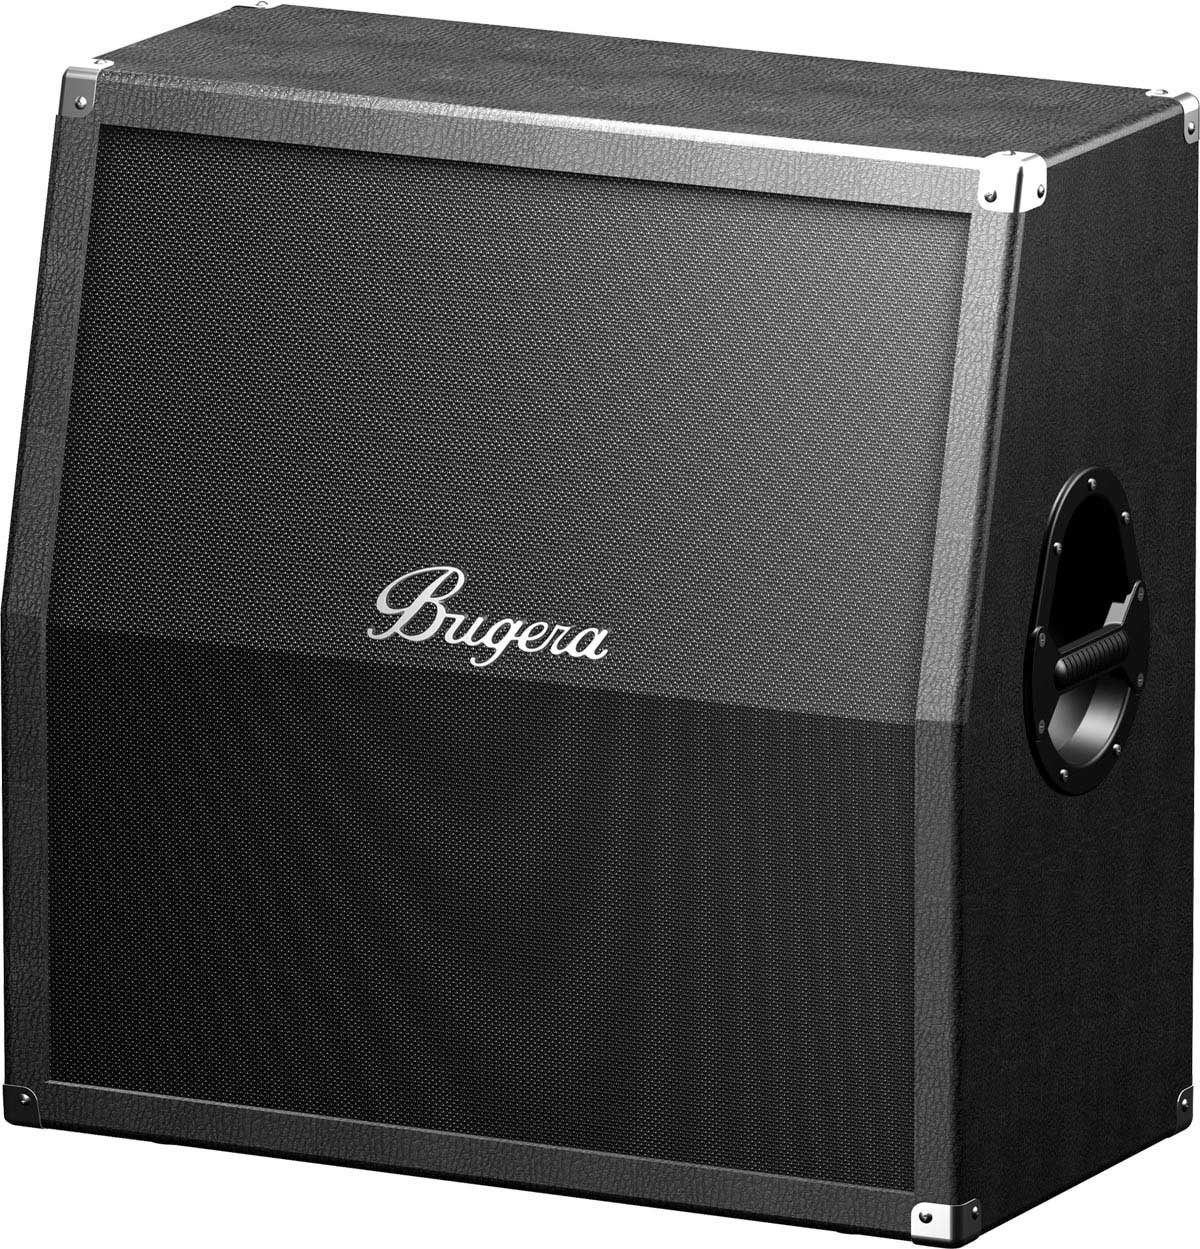 bugera 412h bk used item 4x12 200w stereo guitar speaker cabinet full compass. Black Bedroom Furniture Sets. Home Design Ideas